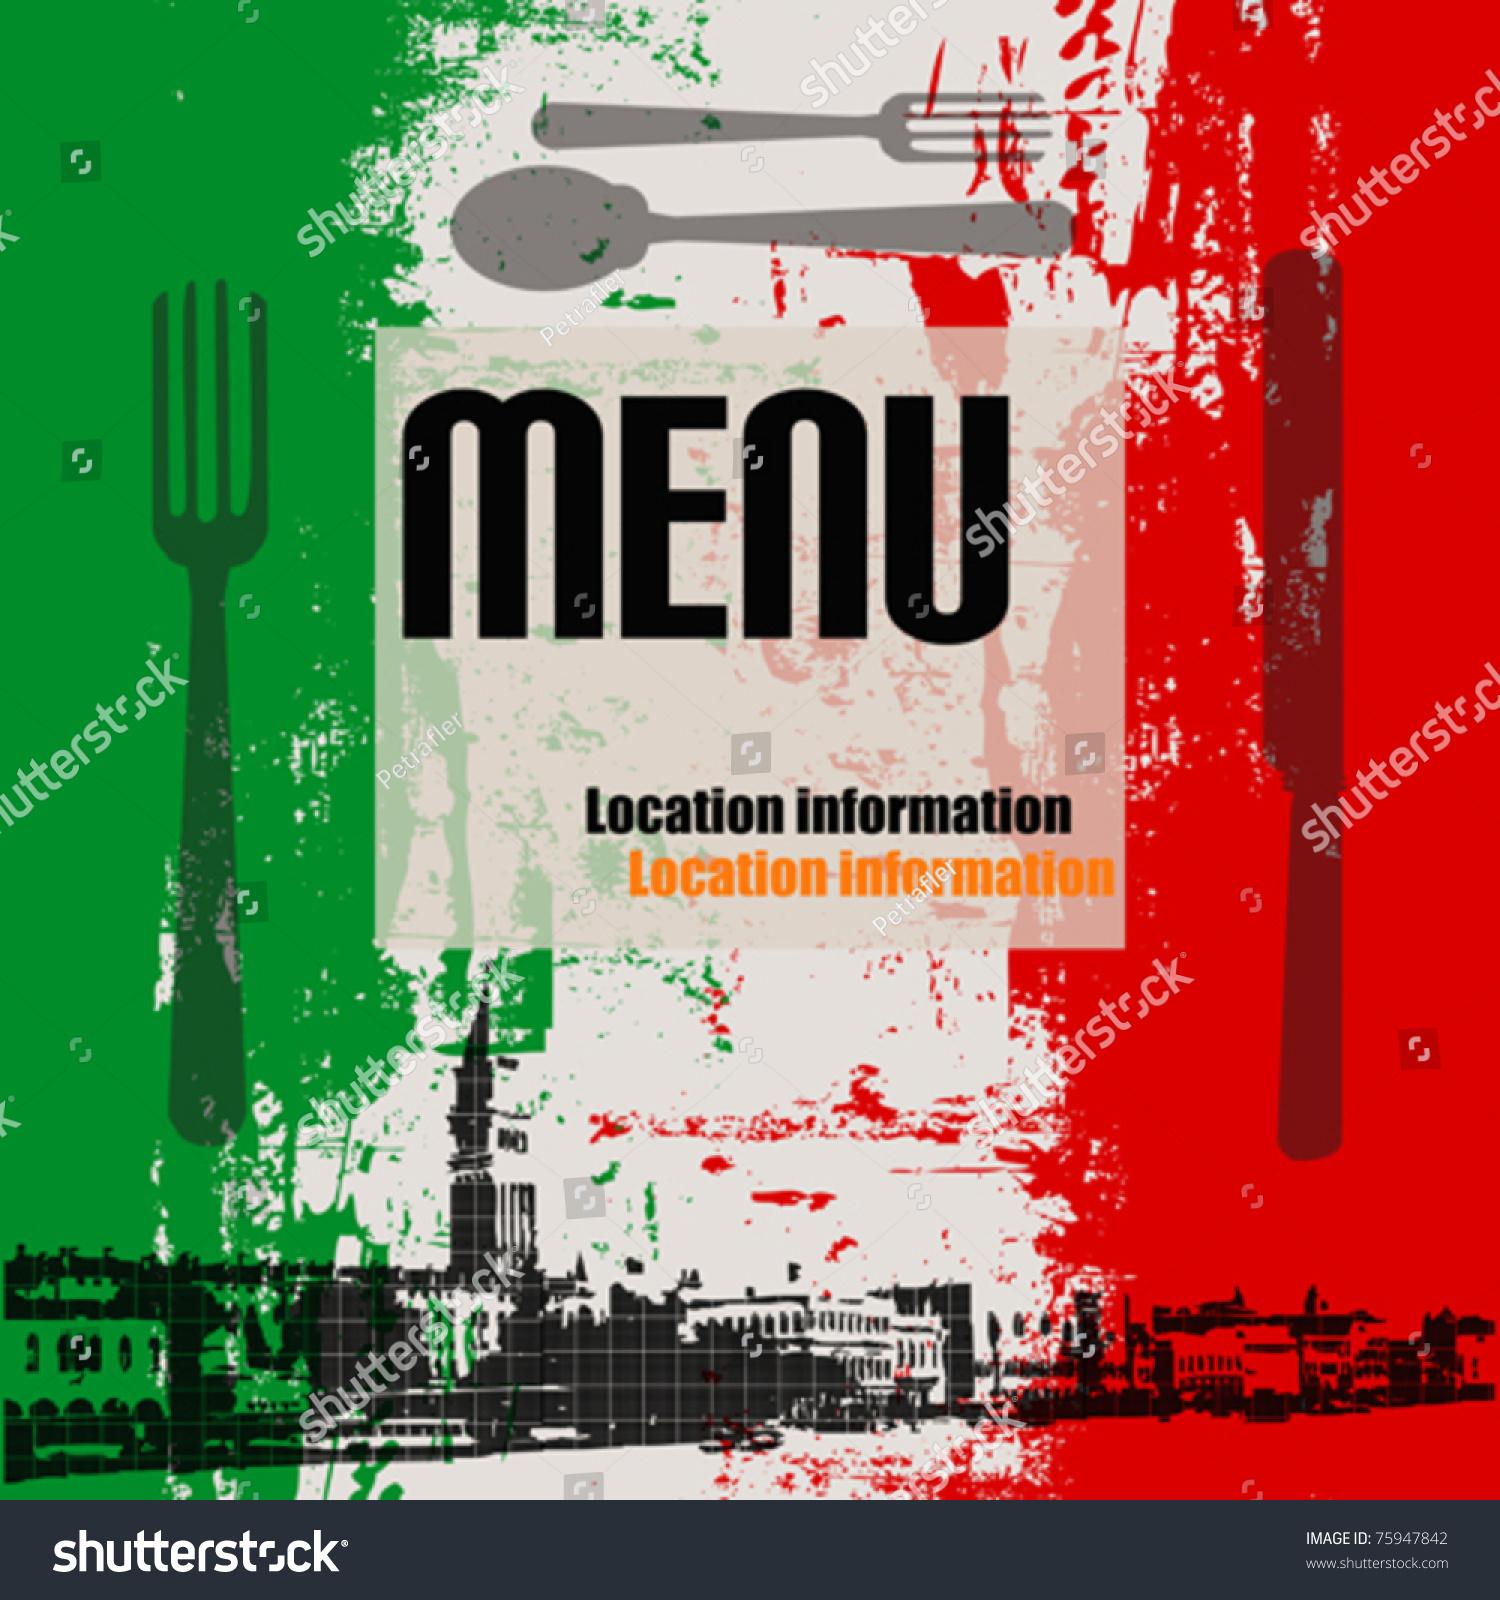 Italian Restaurant Logo With Flag: Italian Menu Vector Template View Venice Stock Vector